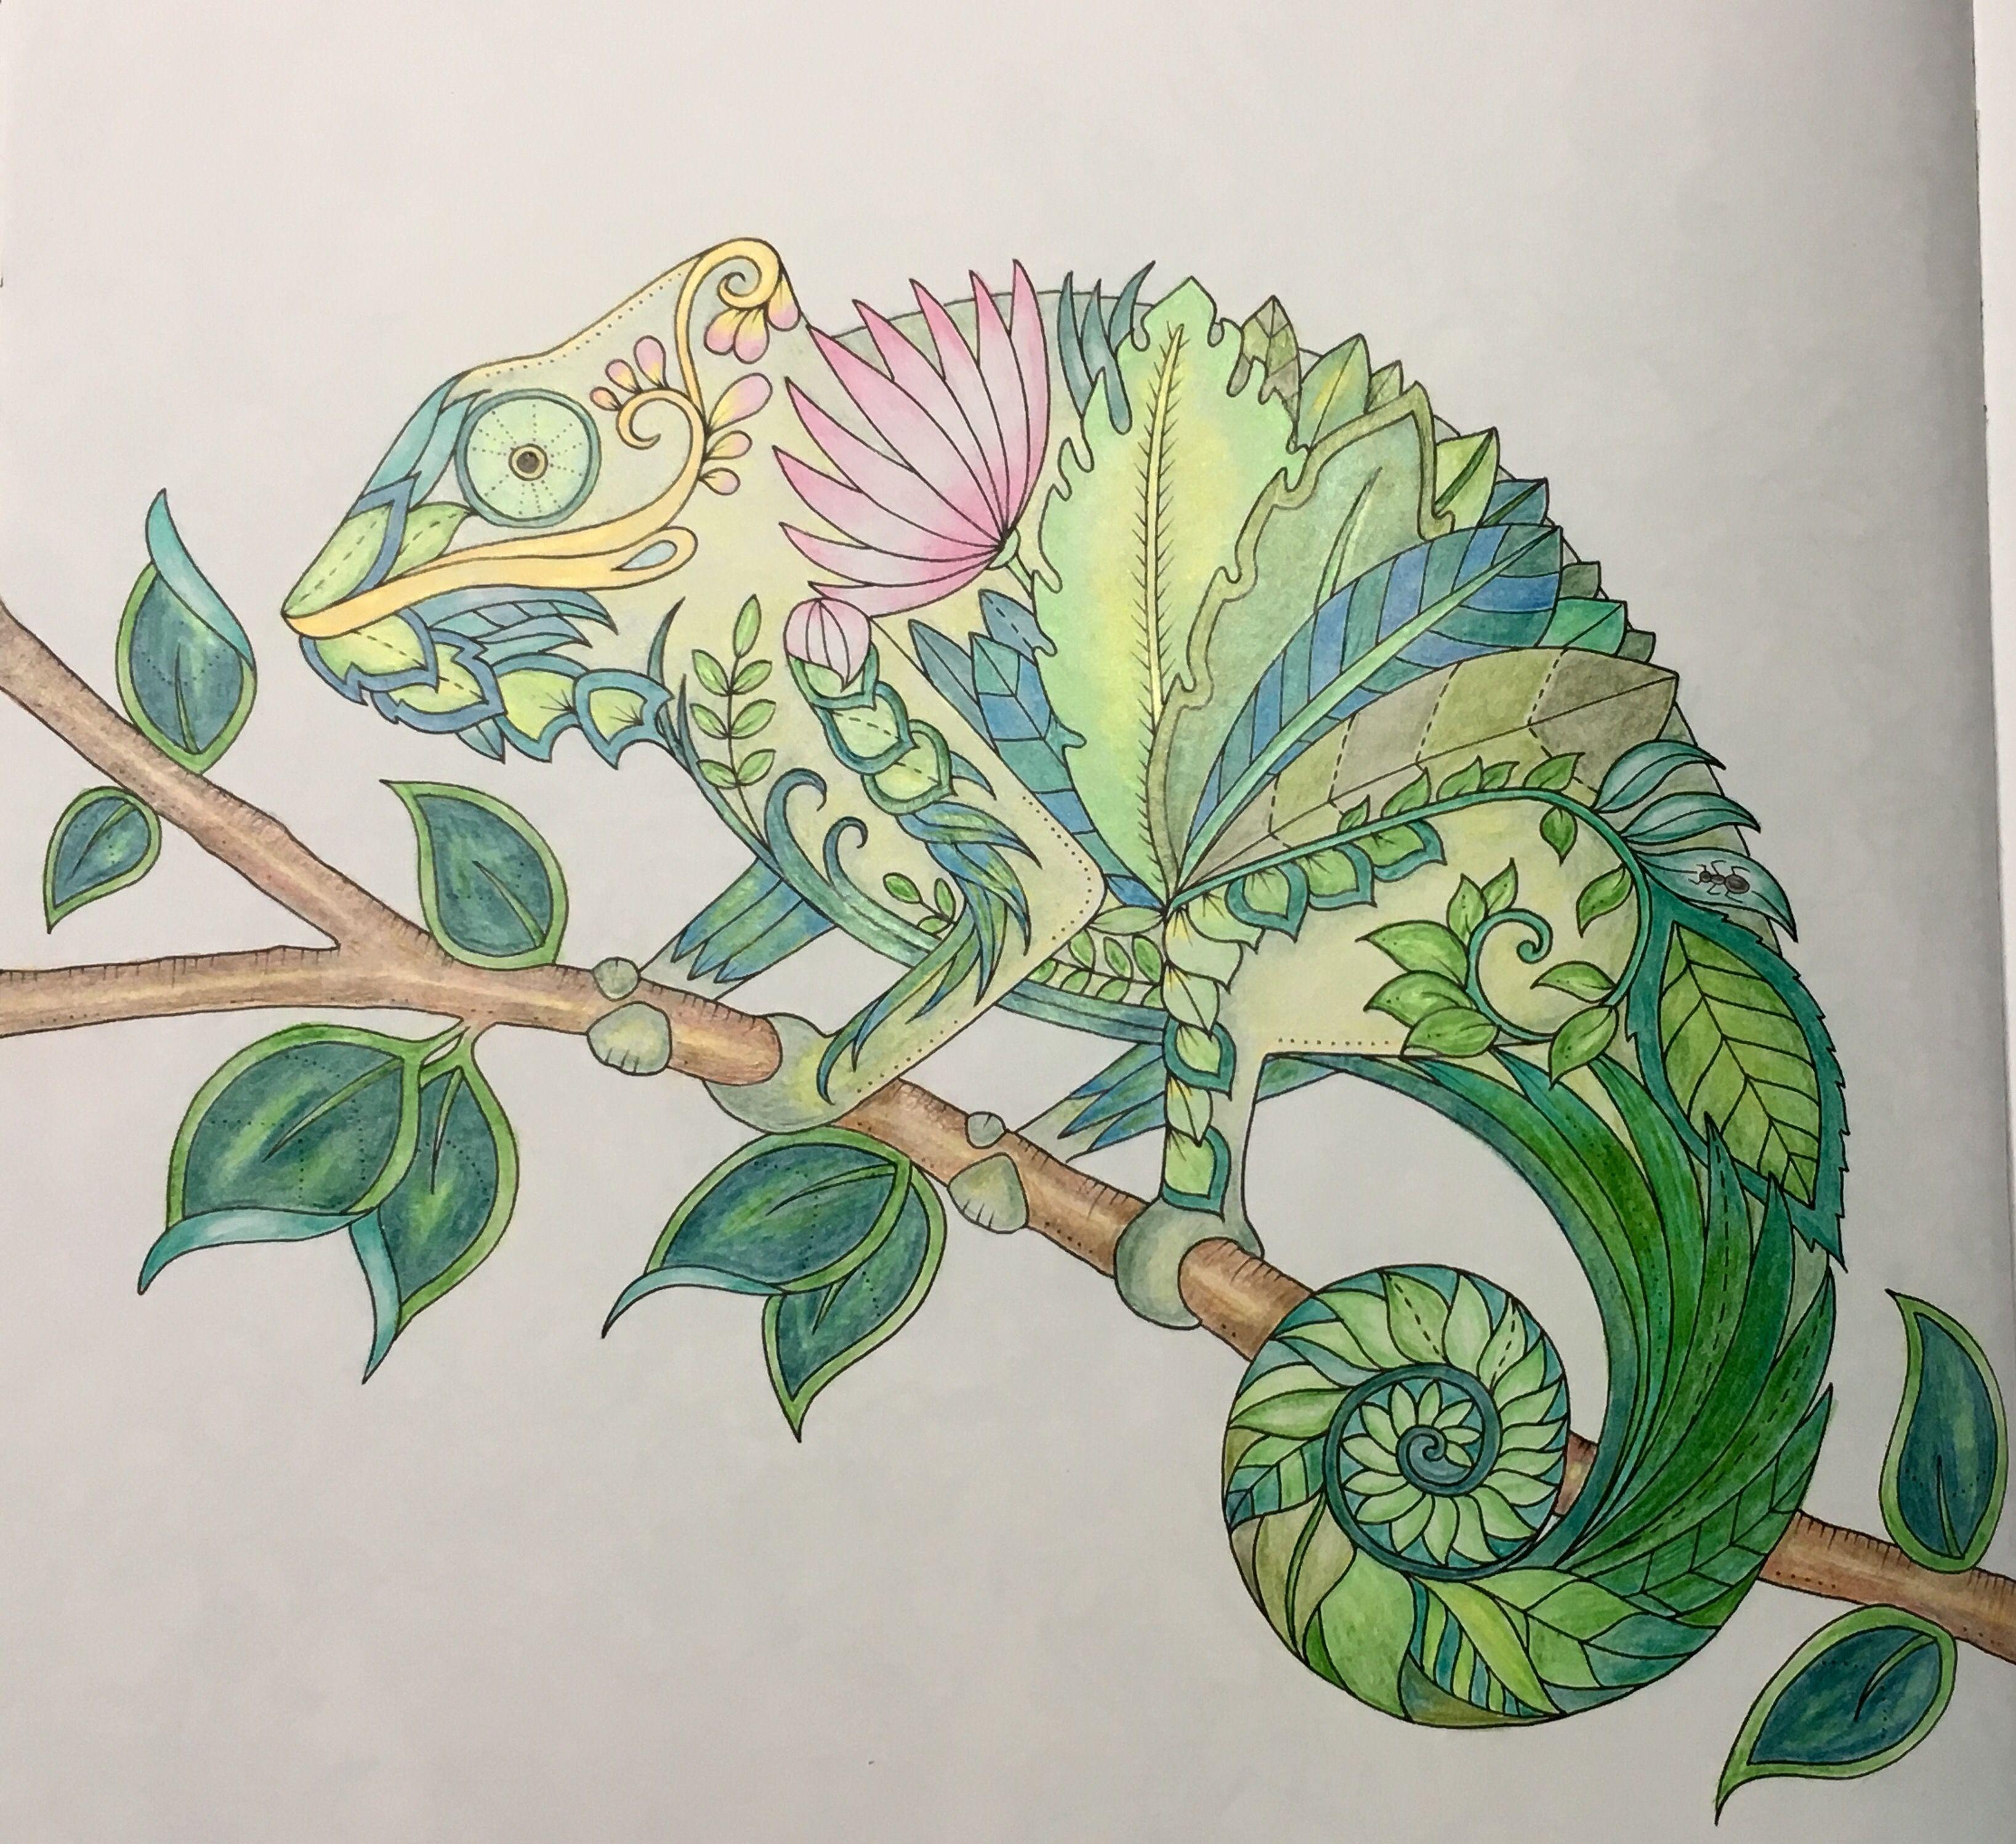 Johanna Basford Coloring Book Chameleon Books Colouring Tropical Paradise Pencil